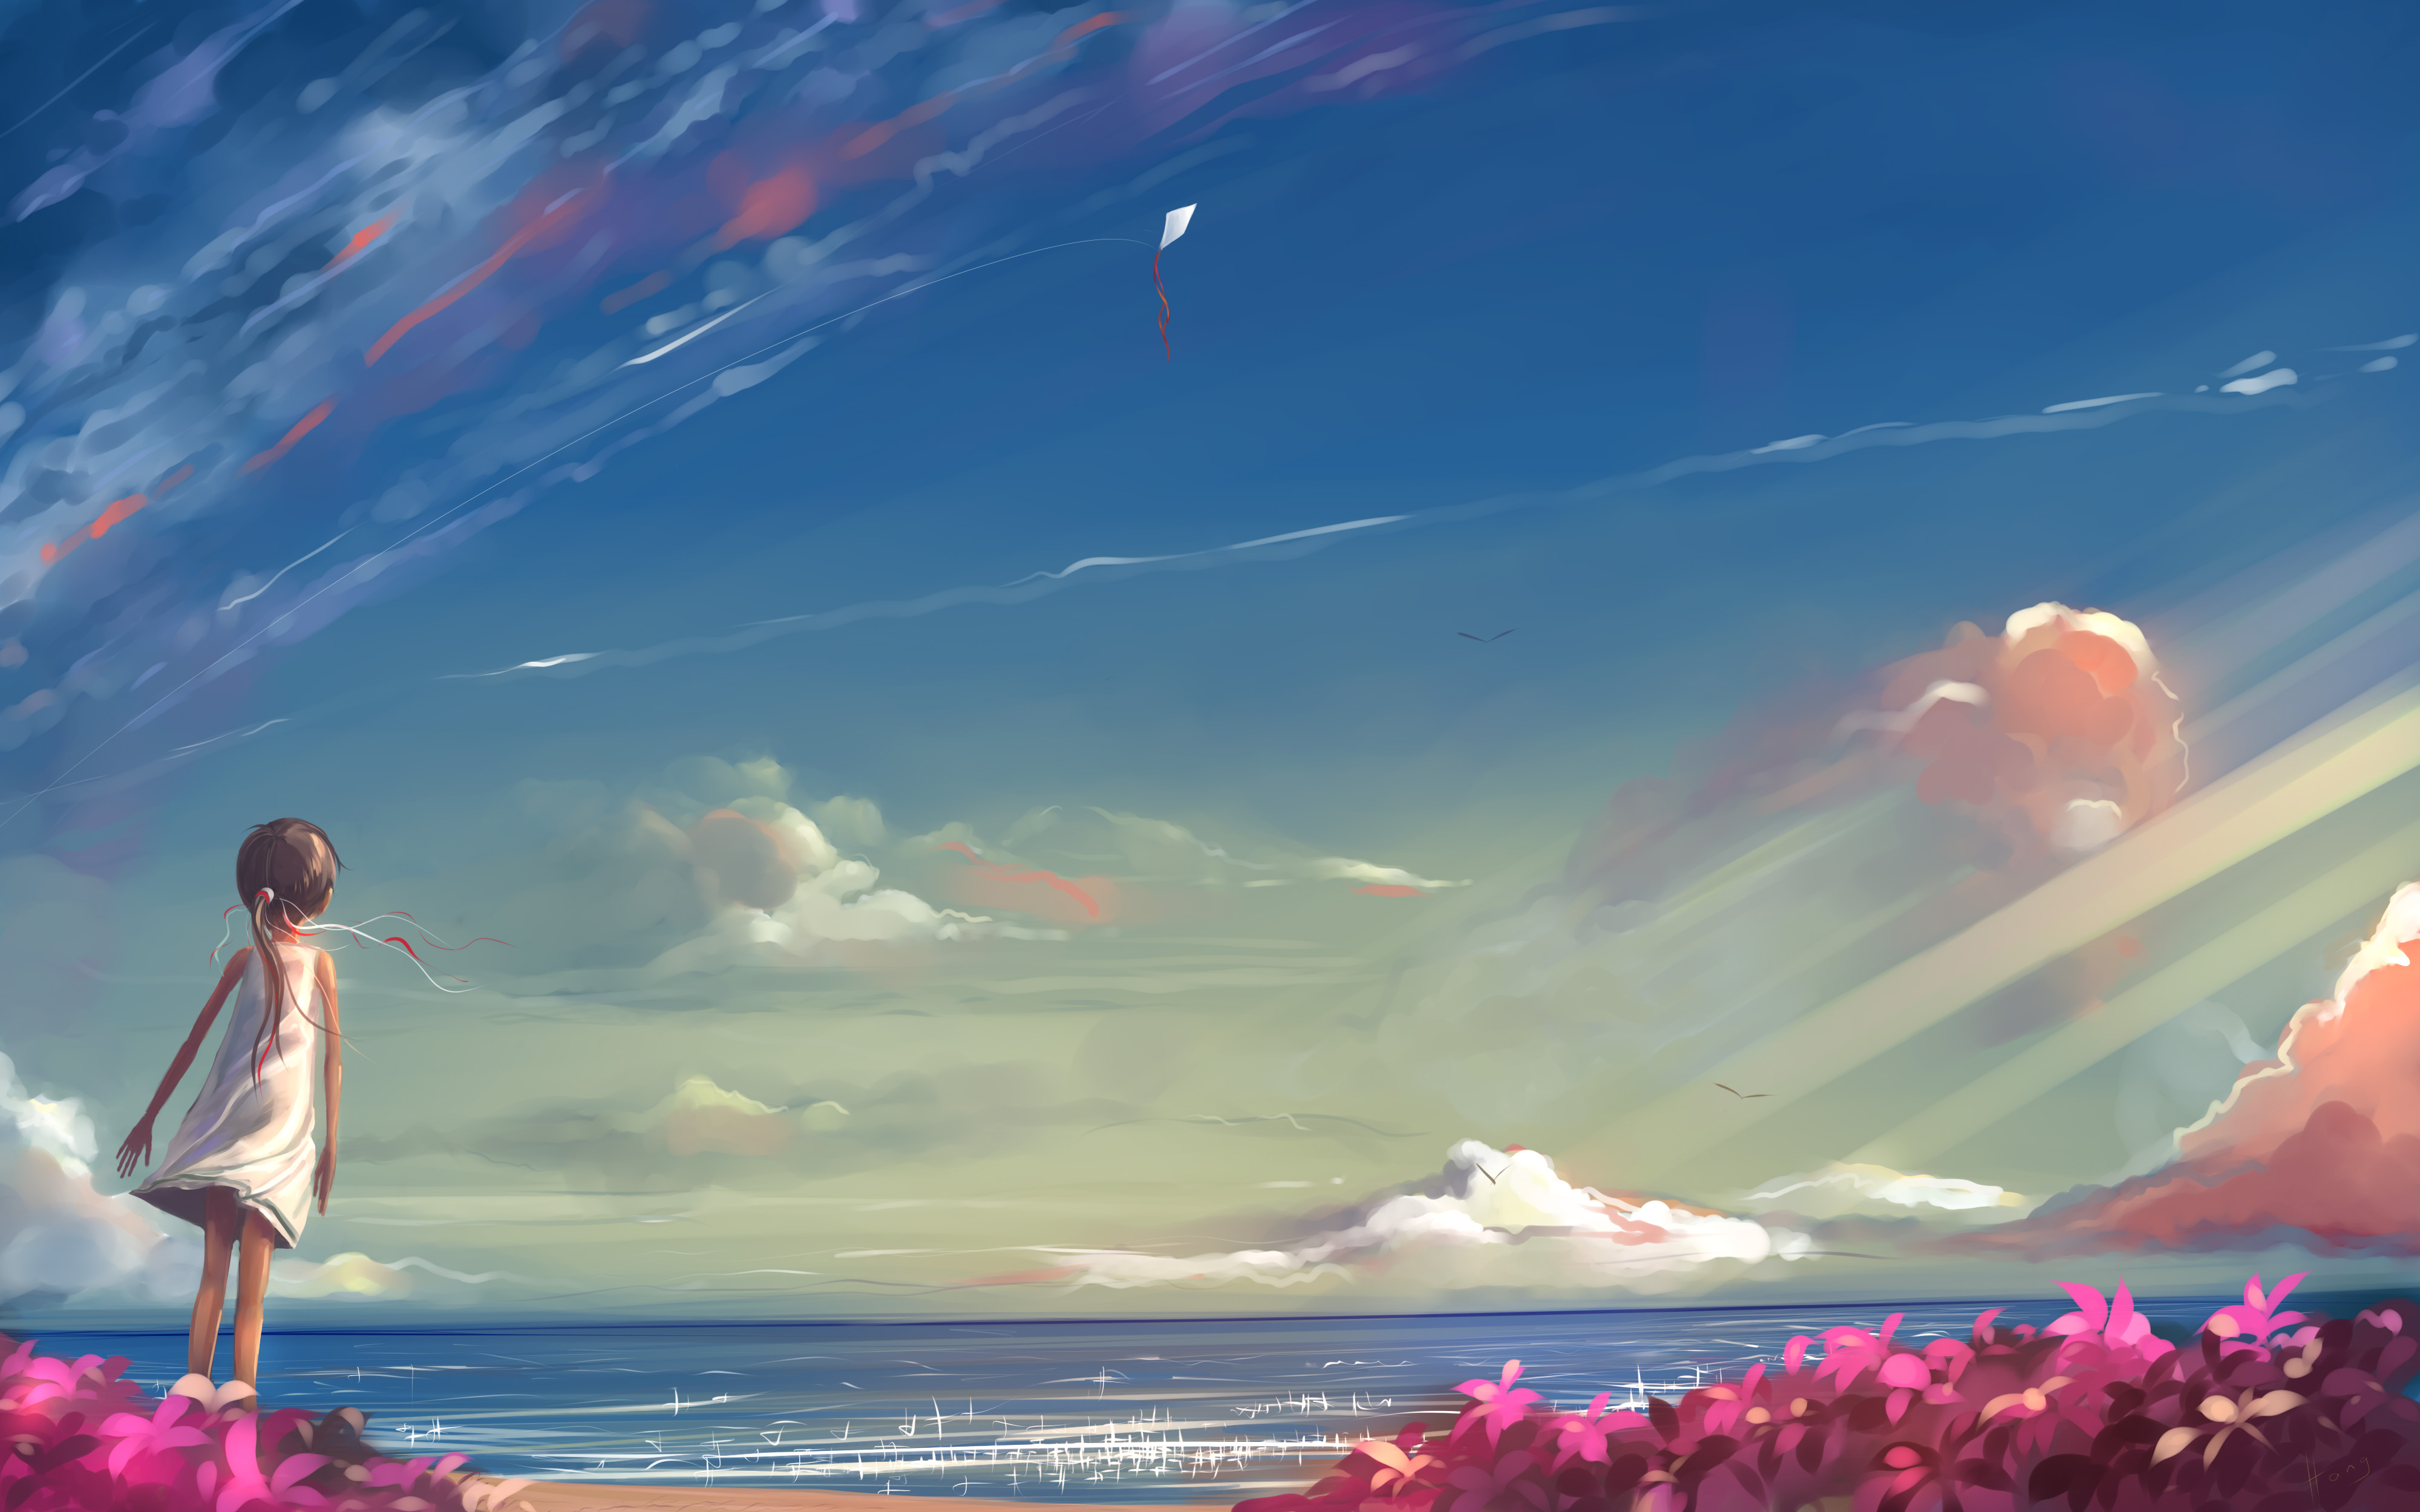 Drawn scenic amazing scenery View version Anime Konachan Click